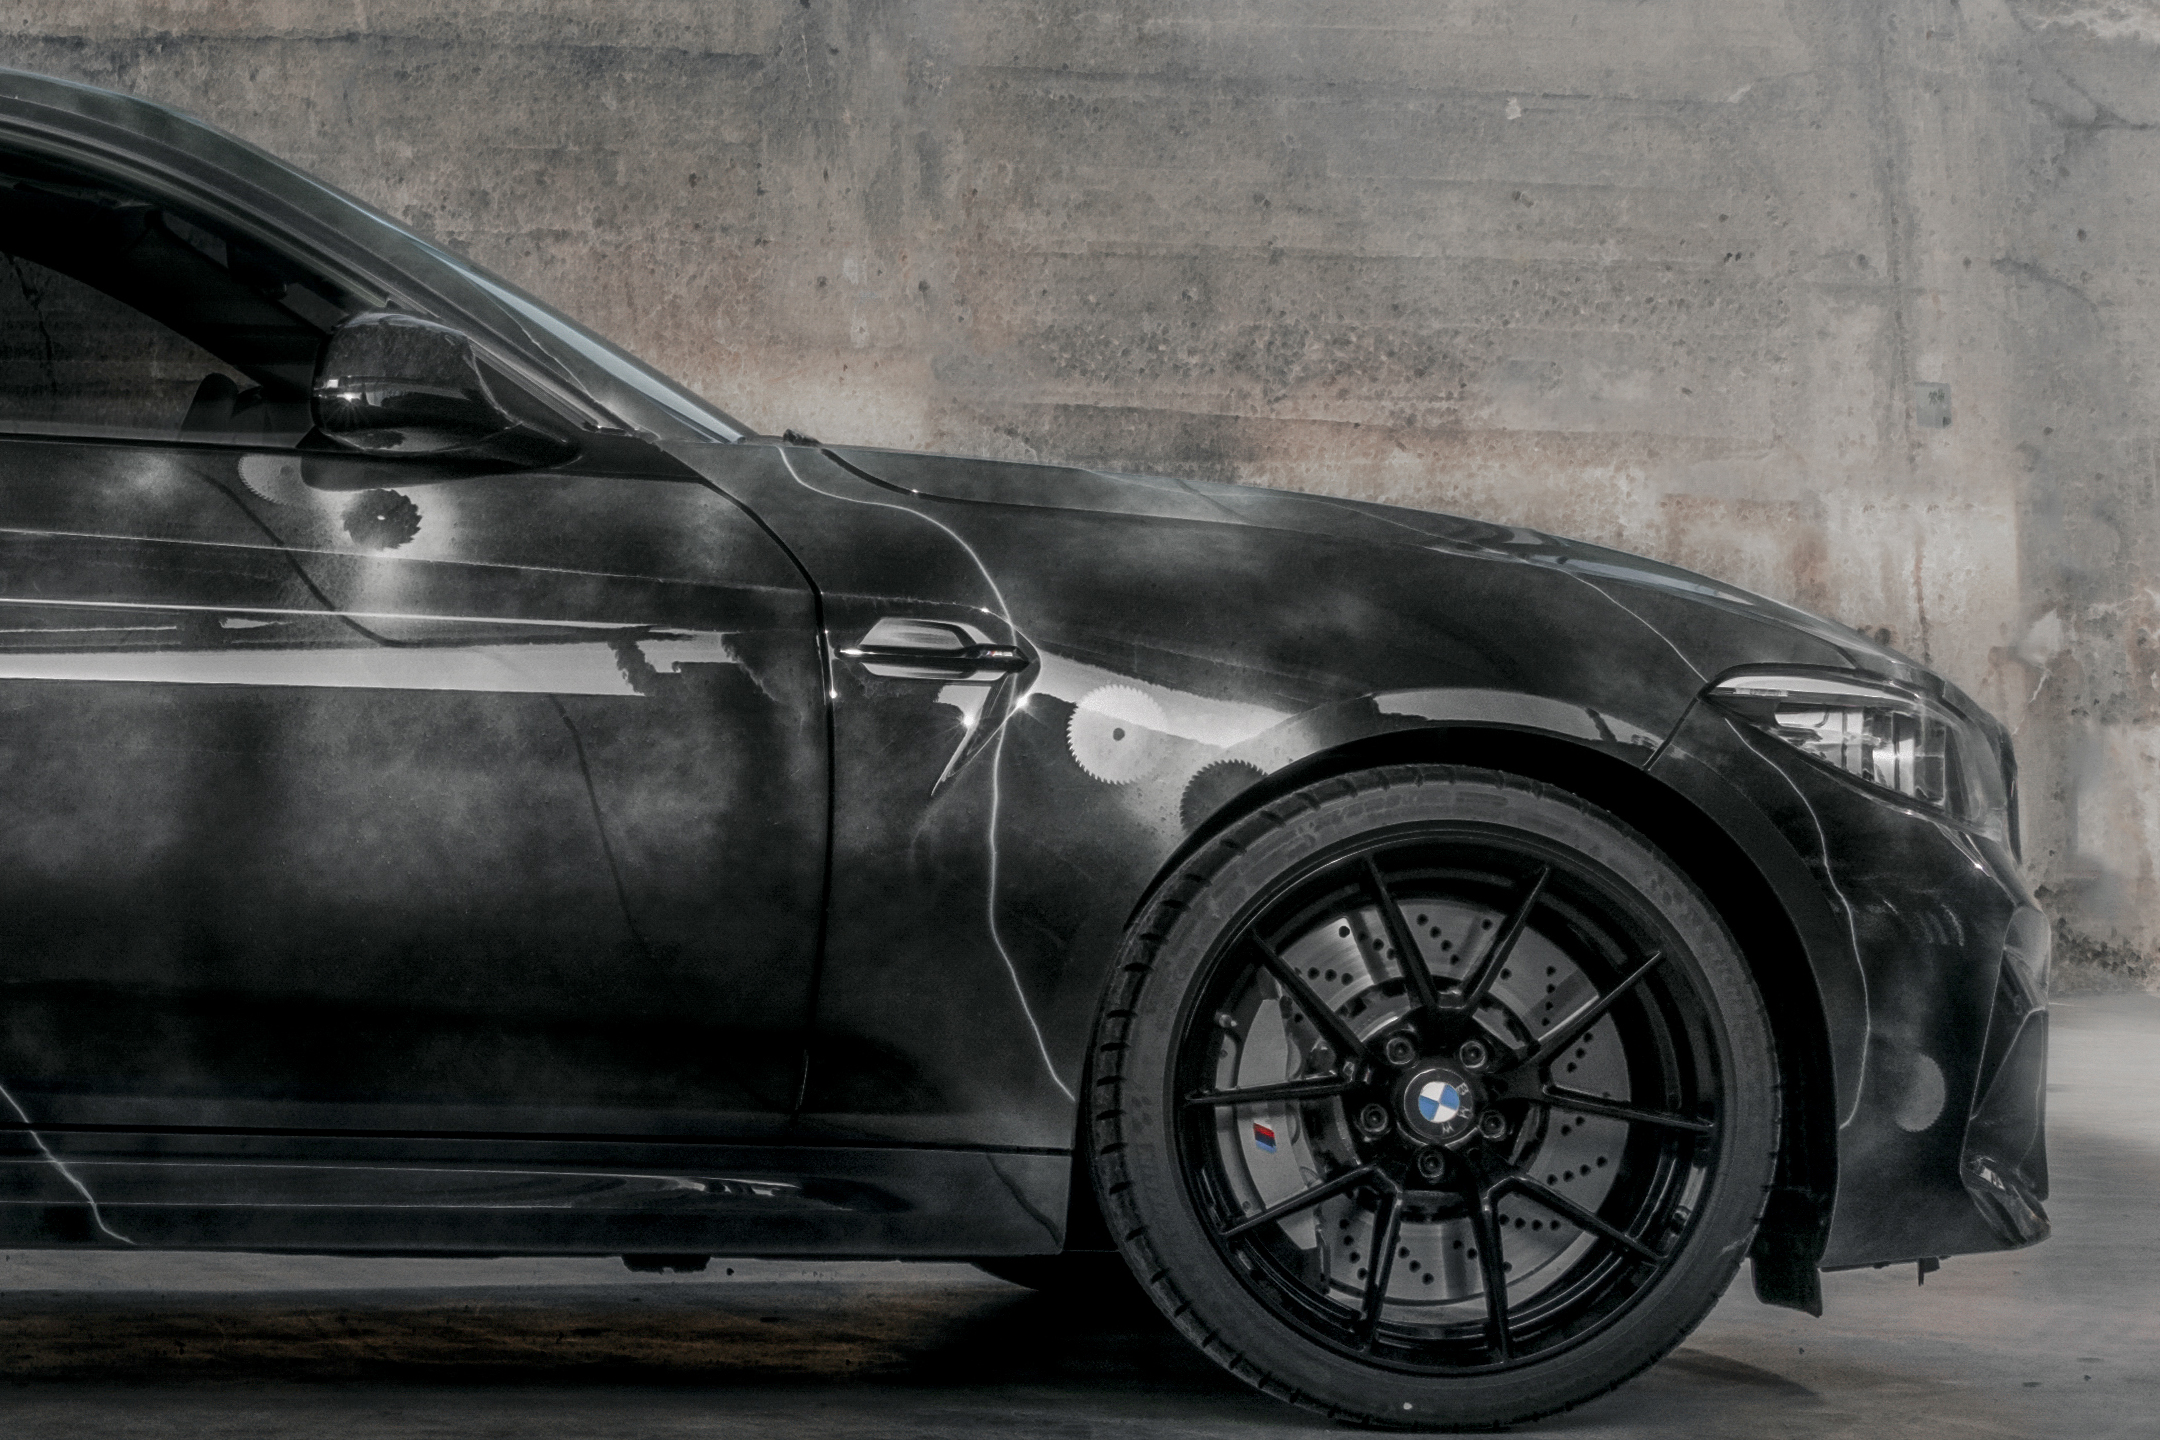 BMW M2 by FUTURA 2000 - Street Art Car - 2020 - front-wheel / jante avant